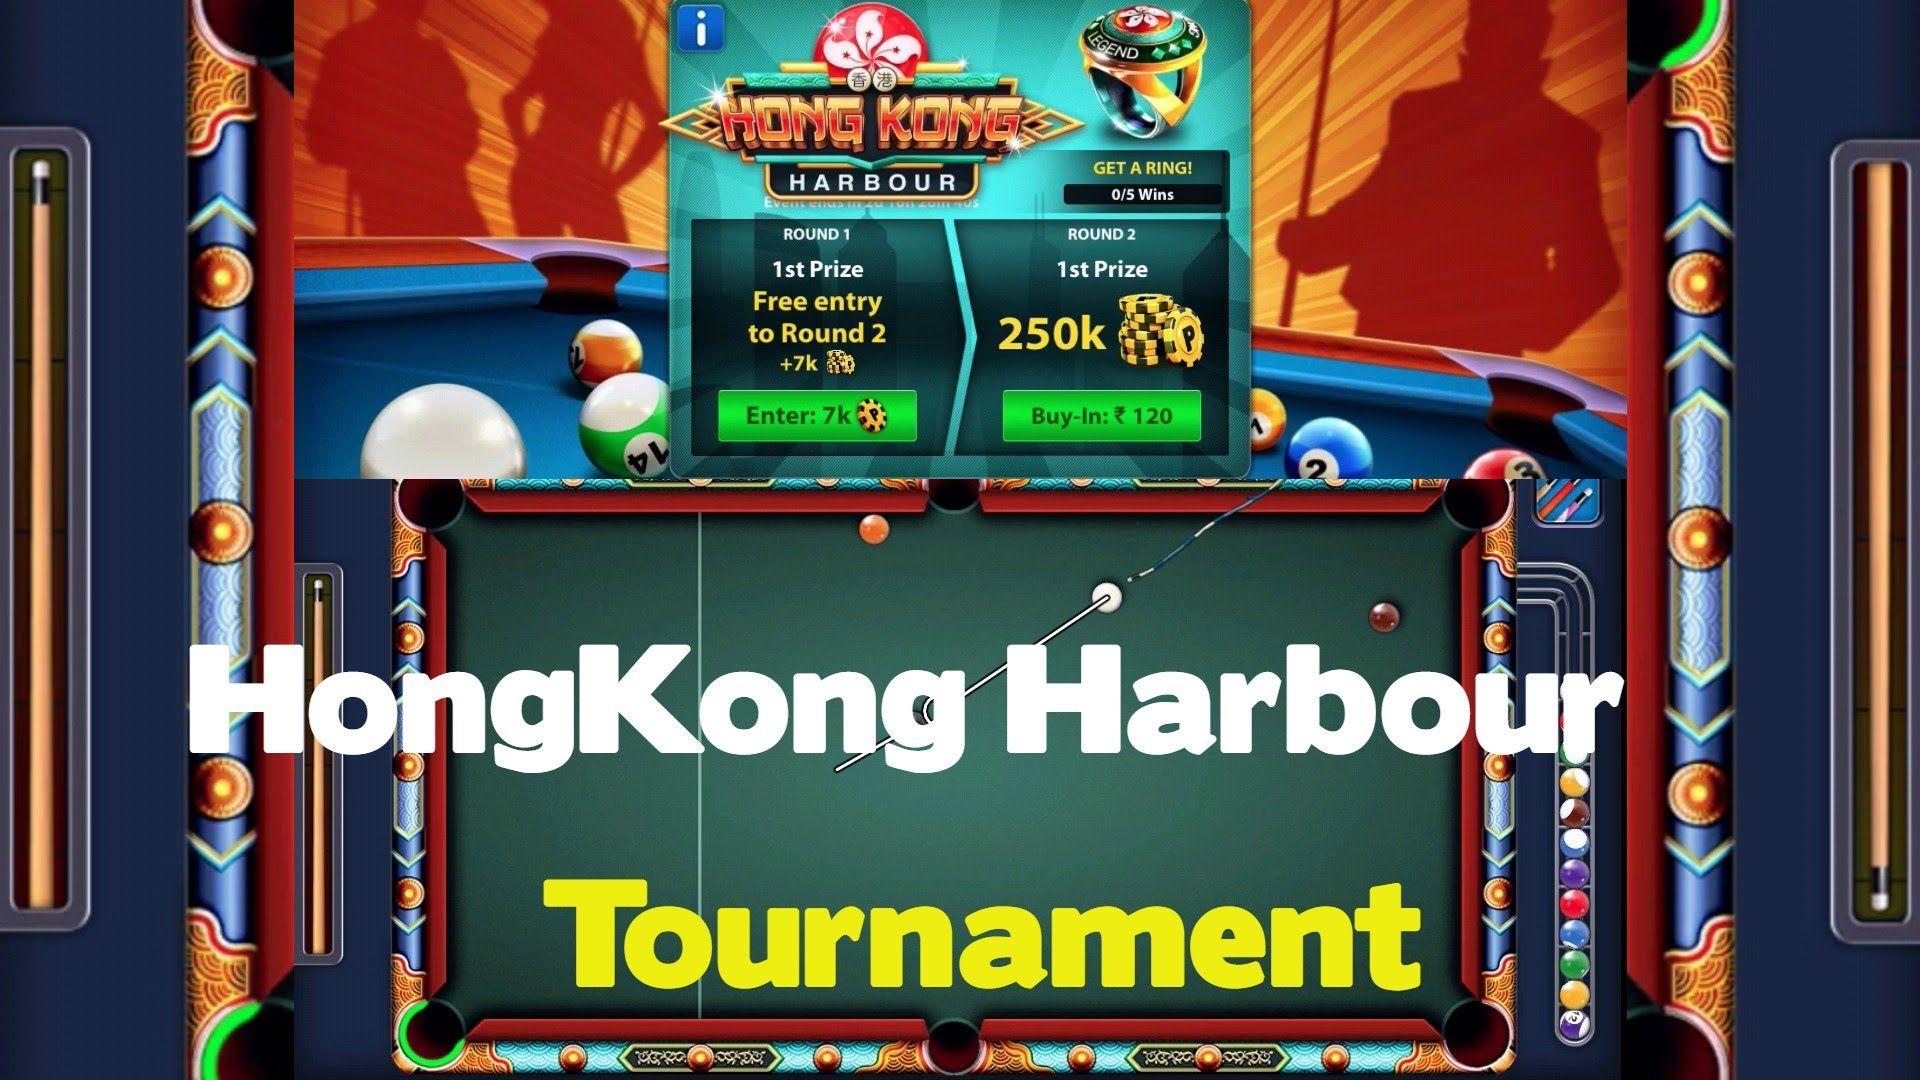 Image Result For 8 Ball Pool Toronto Tournament - Blackball (pool) , HD Wallpaper & Backgrounds